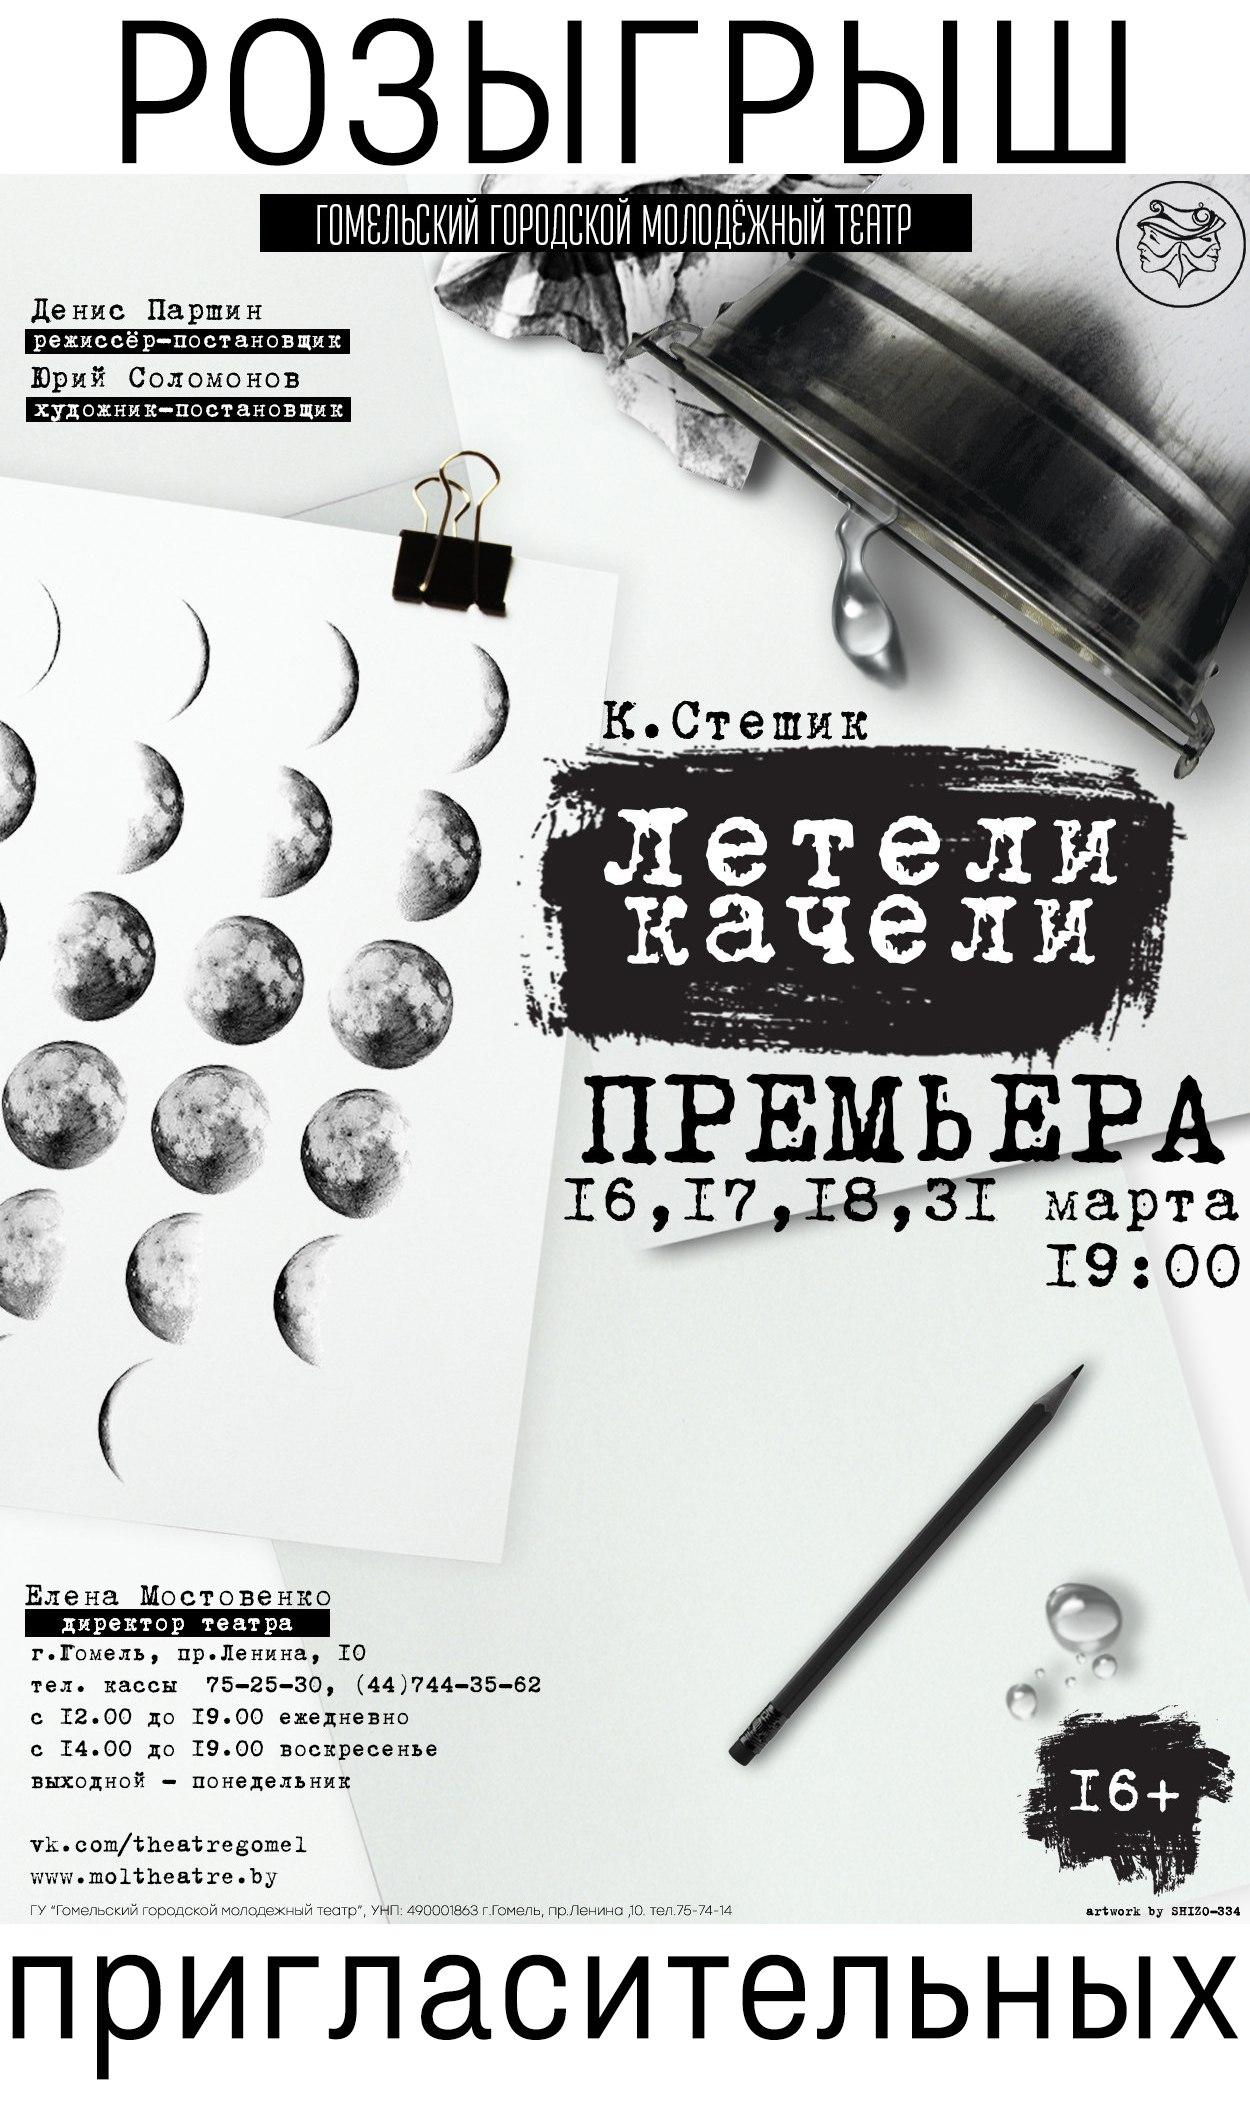 M_Io71yADK8